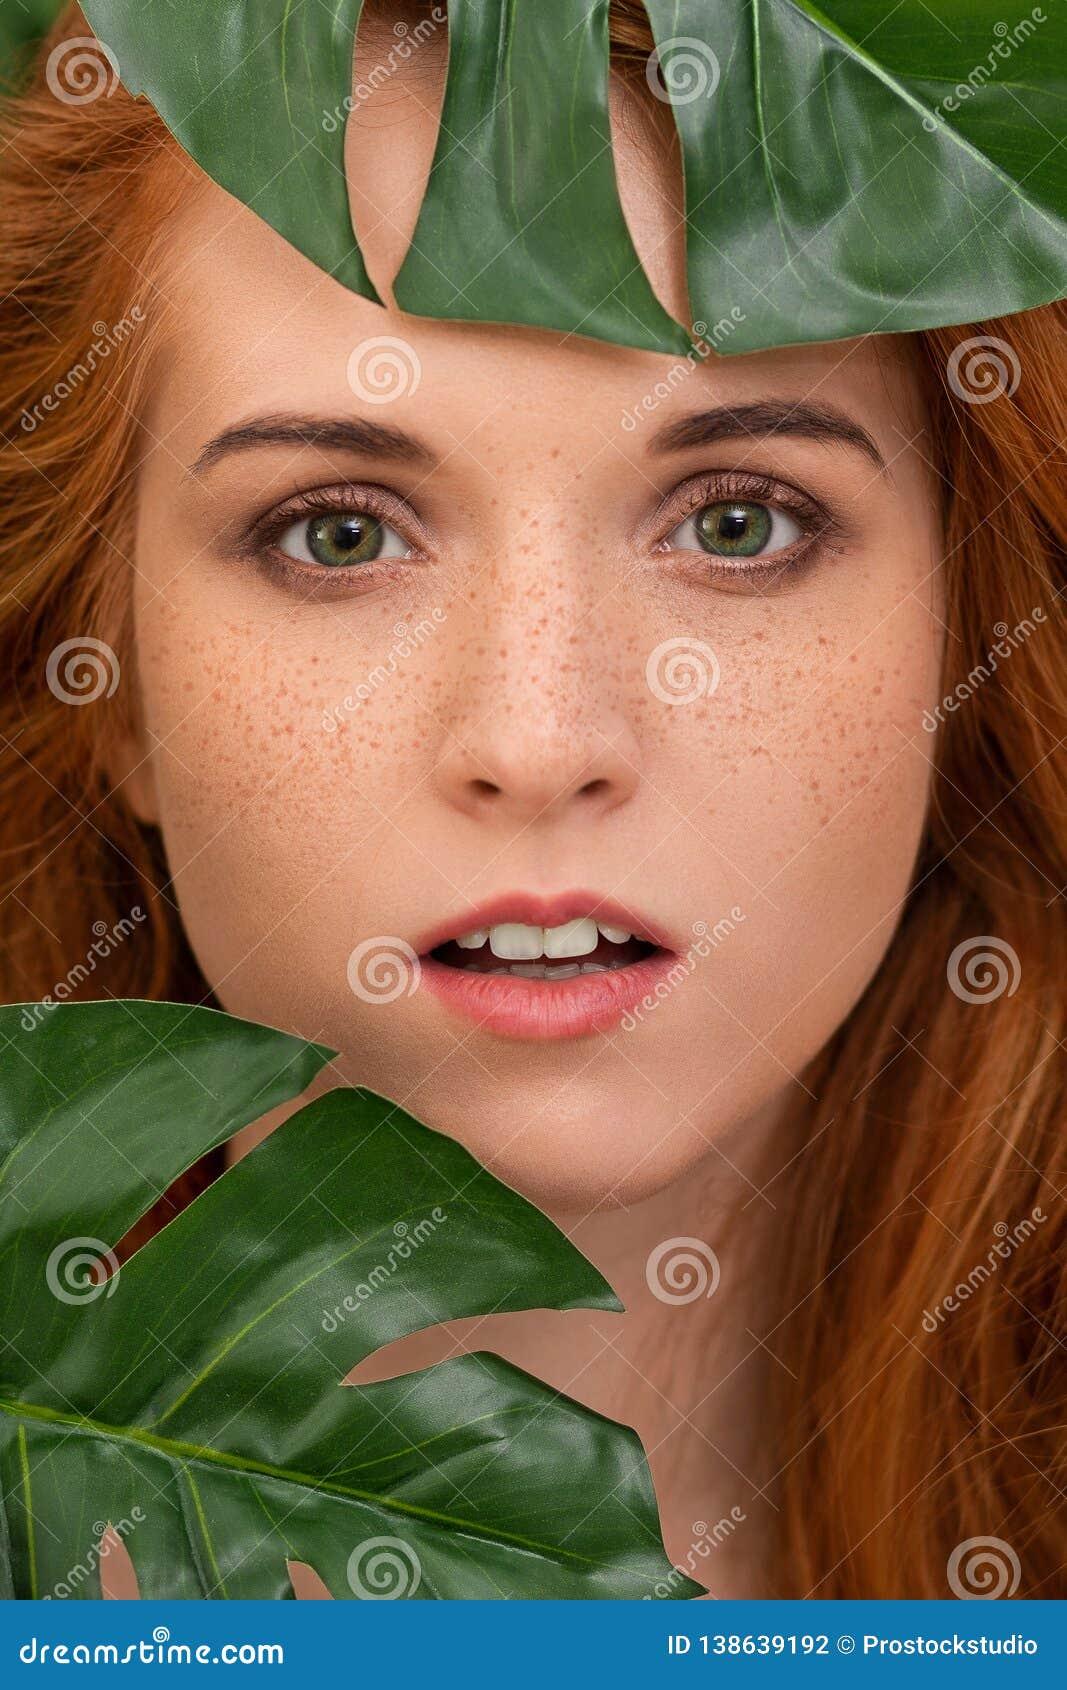 59f75fb64edfa Royalty-Free Stock Photo. Sensual portrait of redhead woman with green  leaves